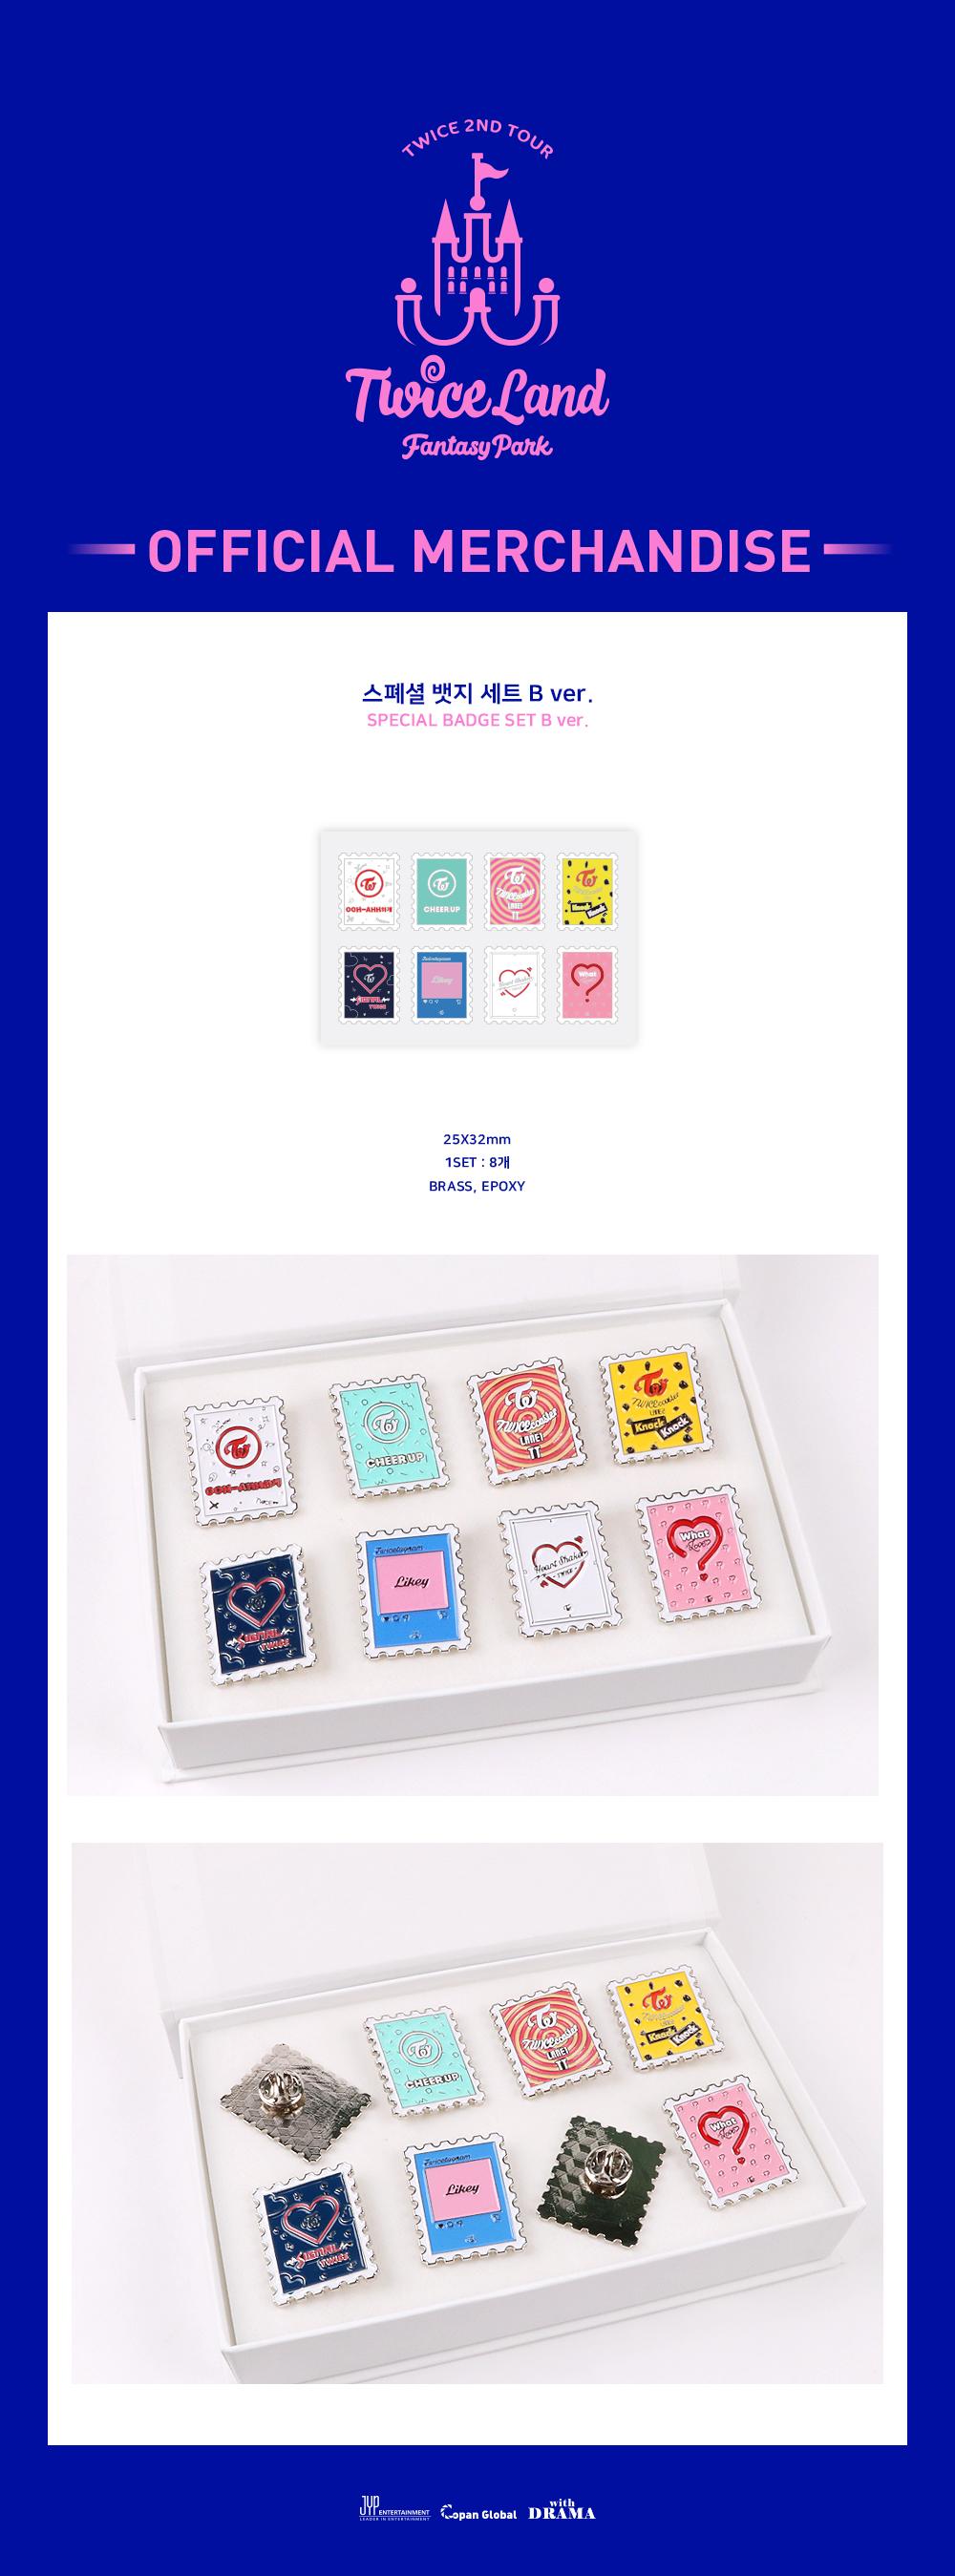 WTB - TWICE Fantasy Park Goods - Special Badge Set Ver  B : kpopforsale